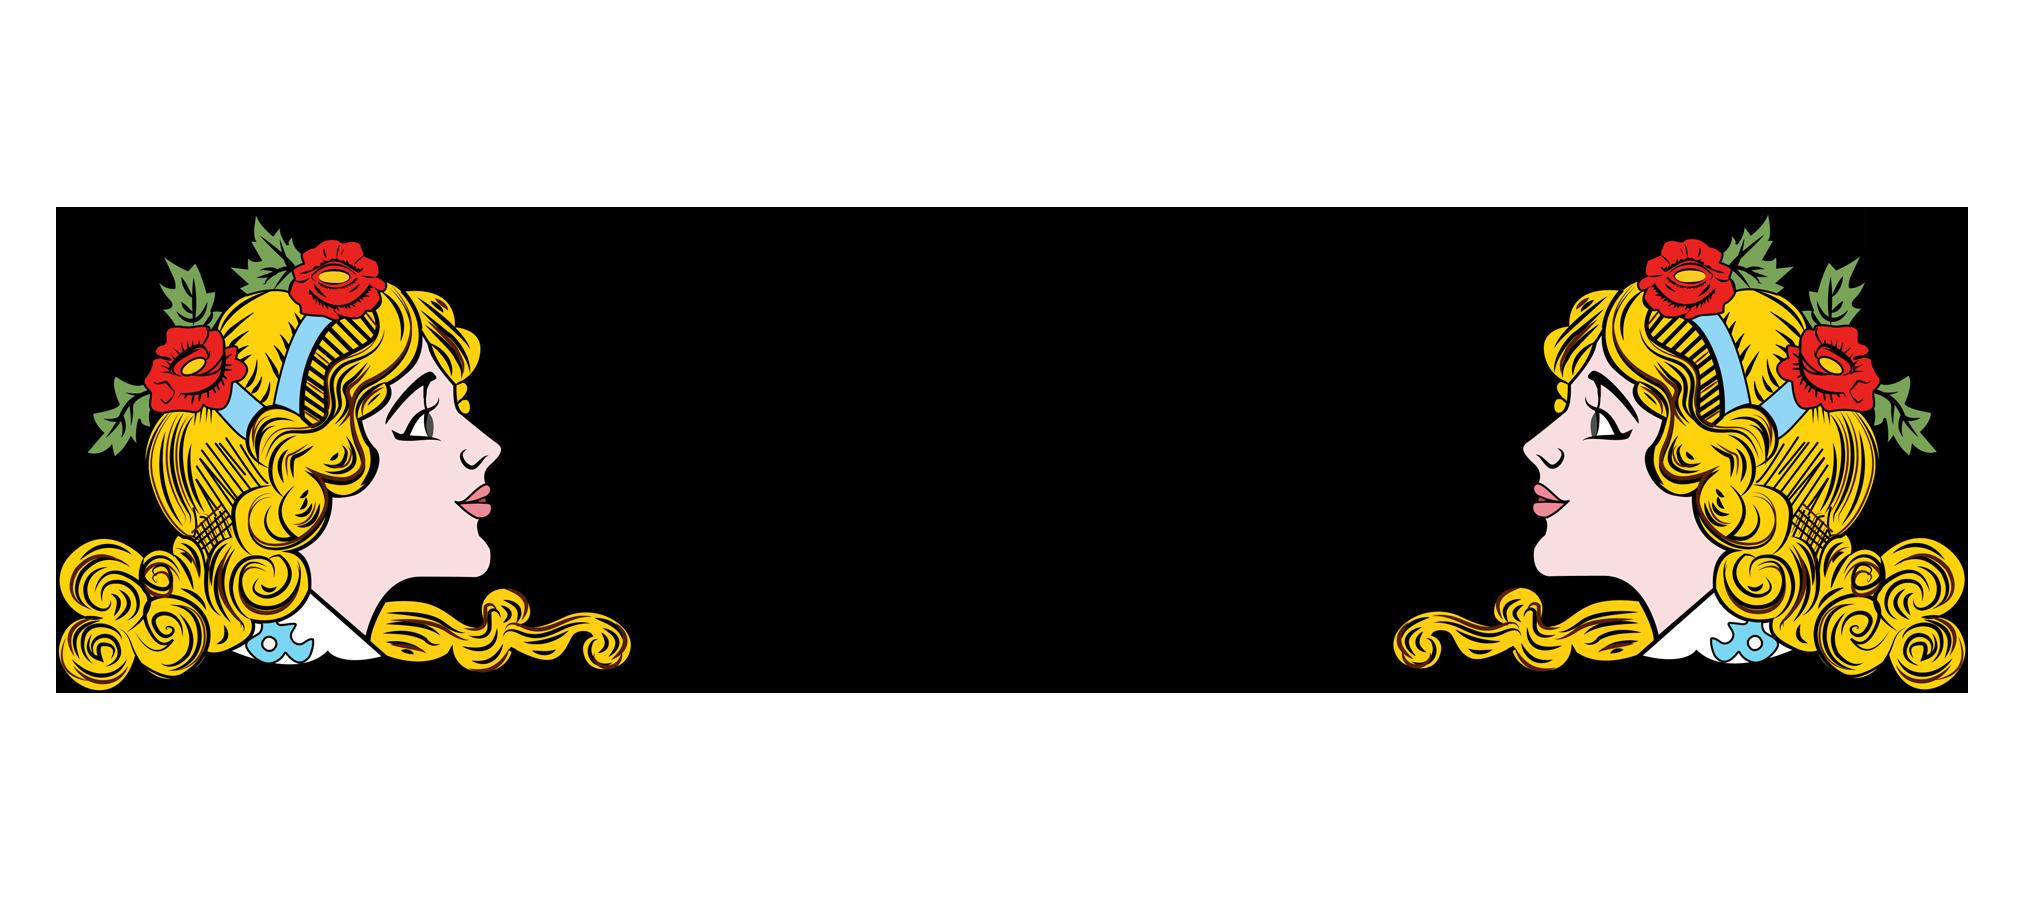 Bobby Bead Logo of women head and words